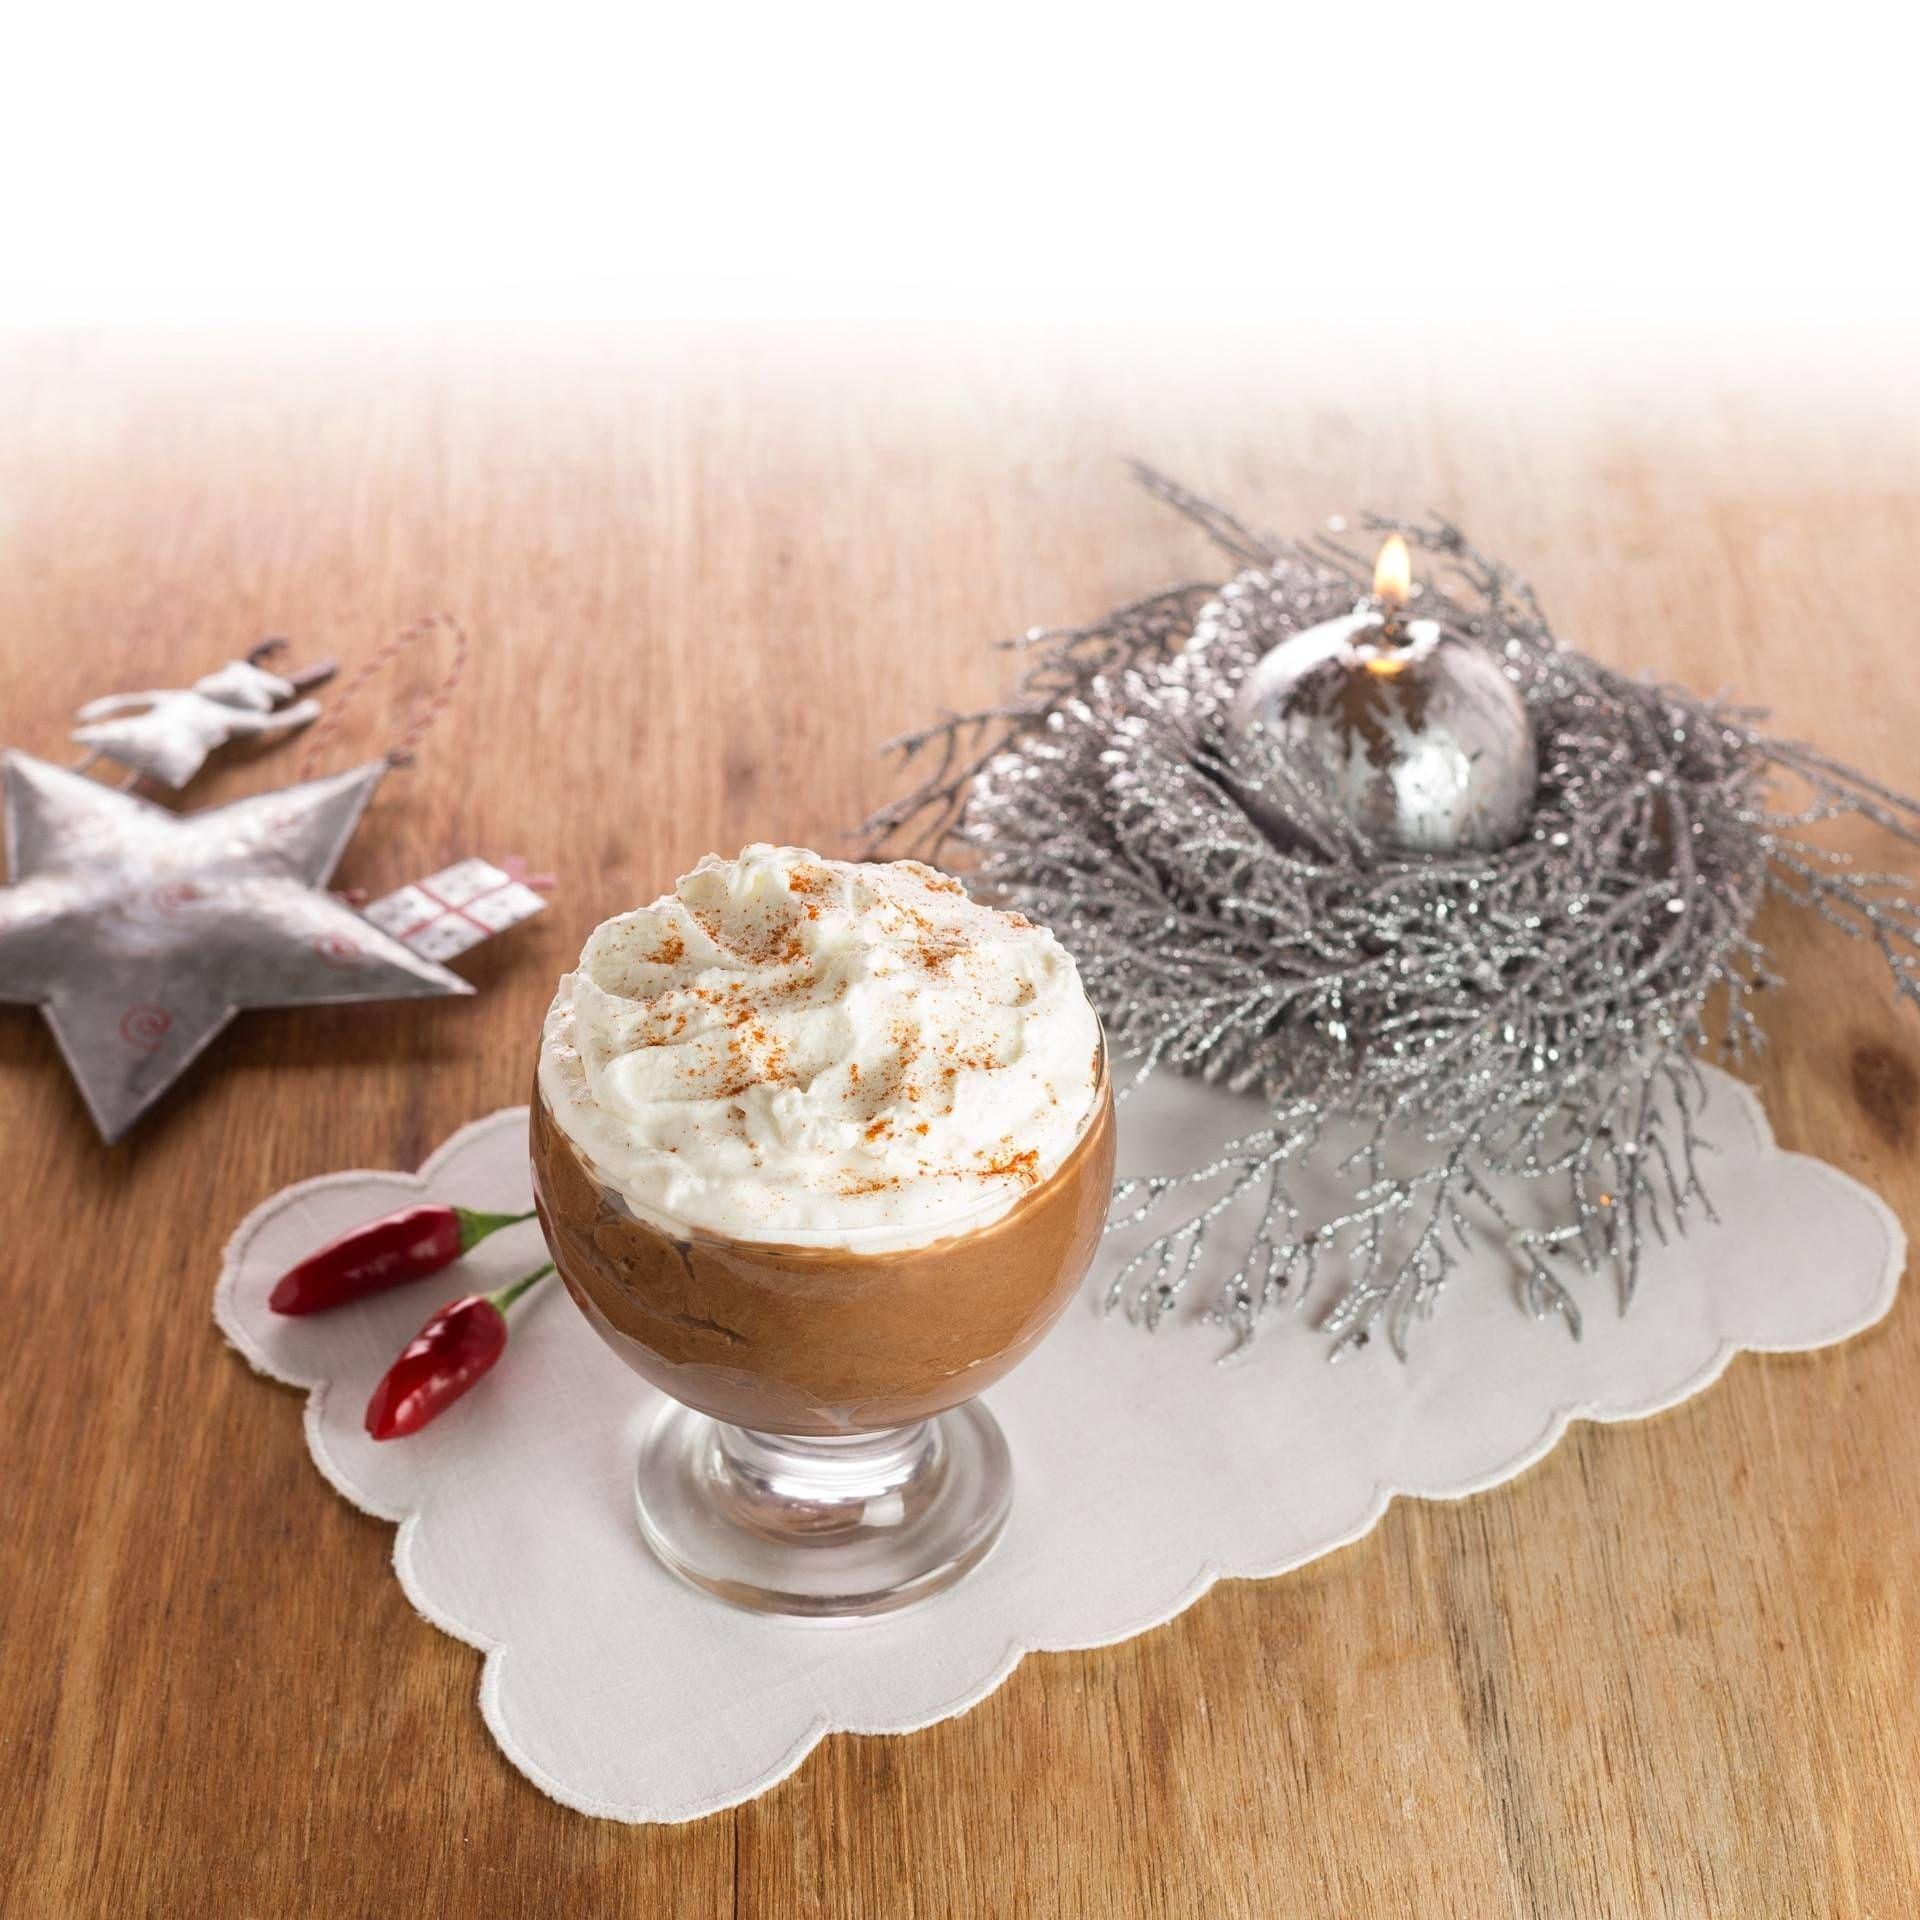 Mousse al cioccolato e peperoncino - Parmalat